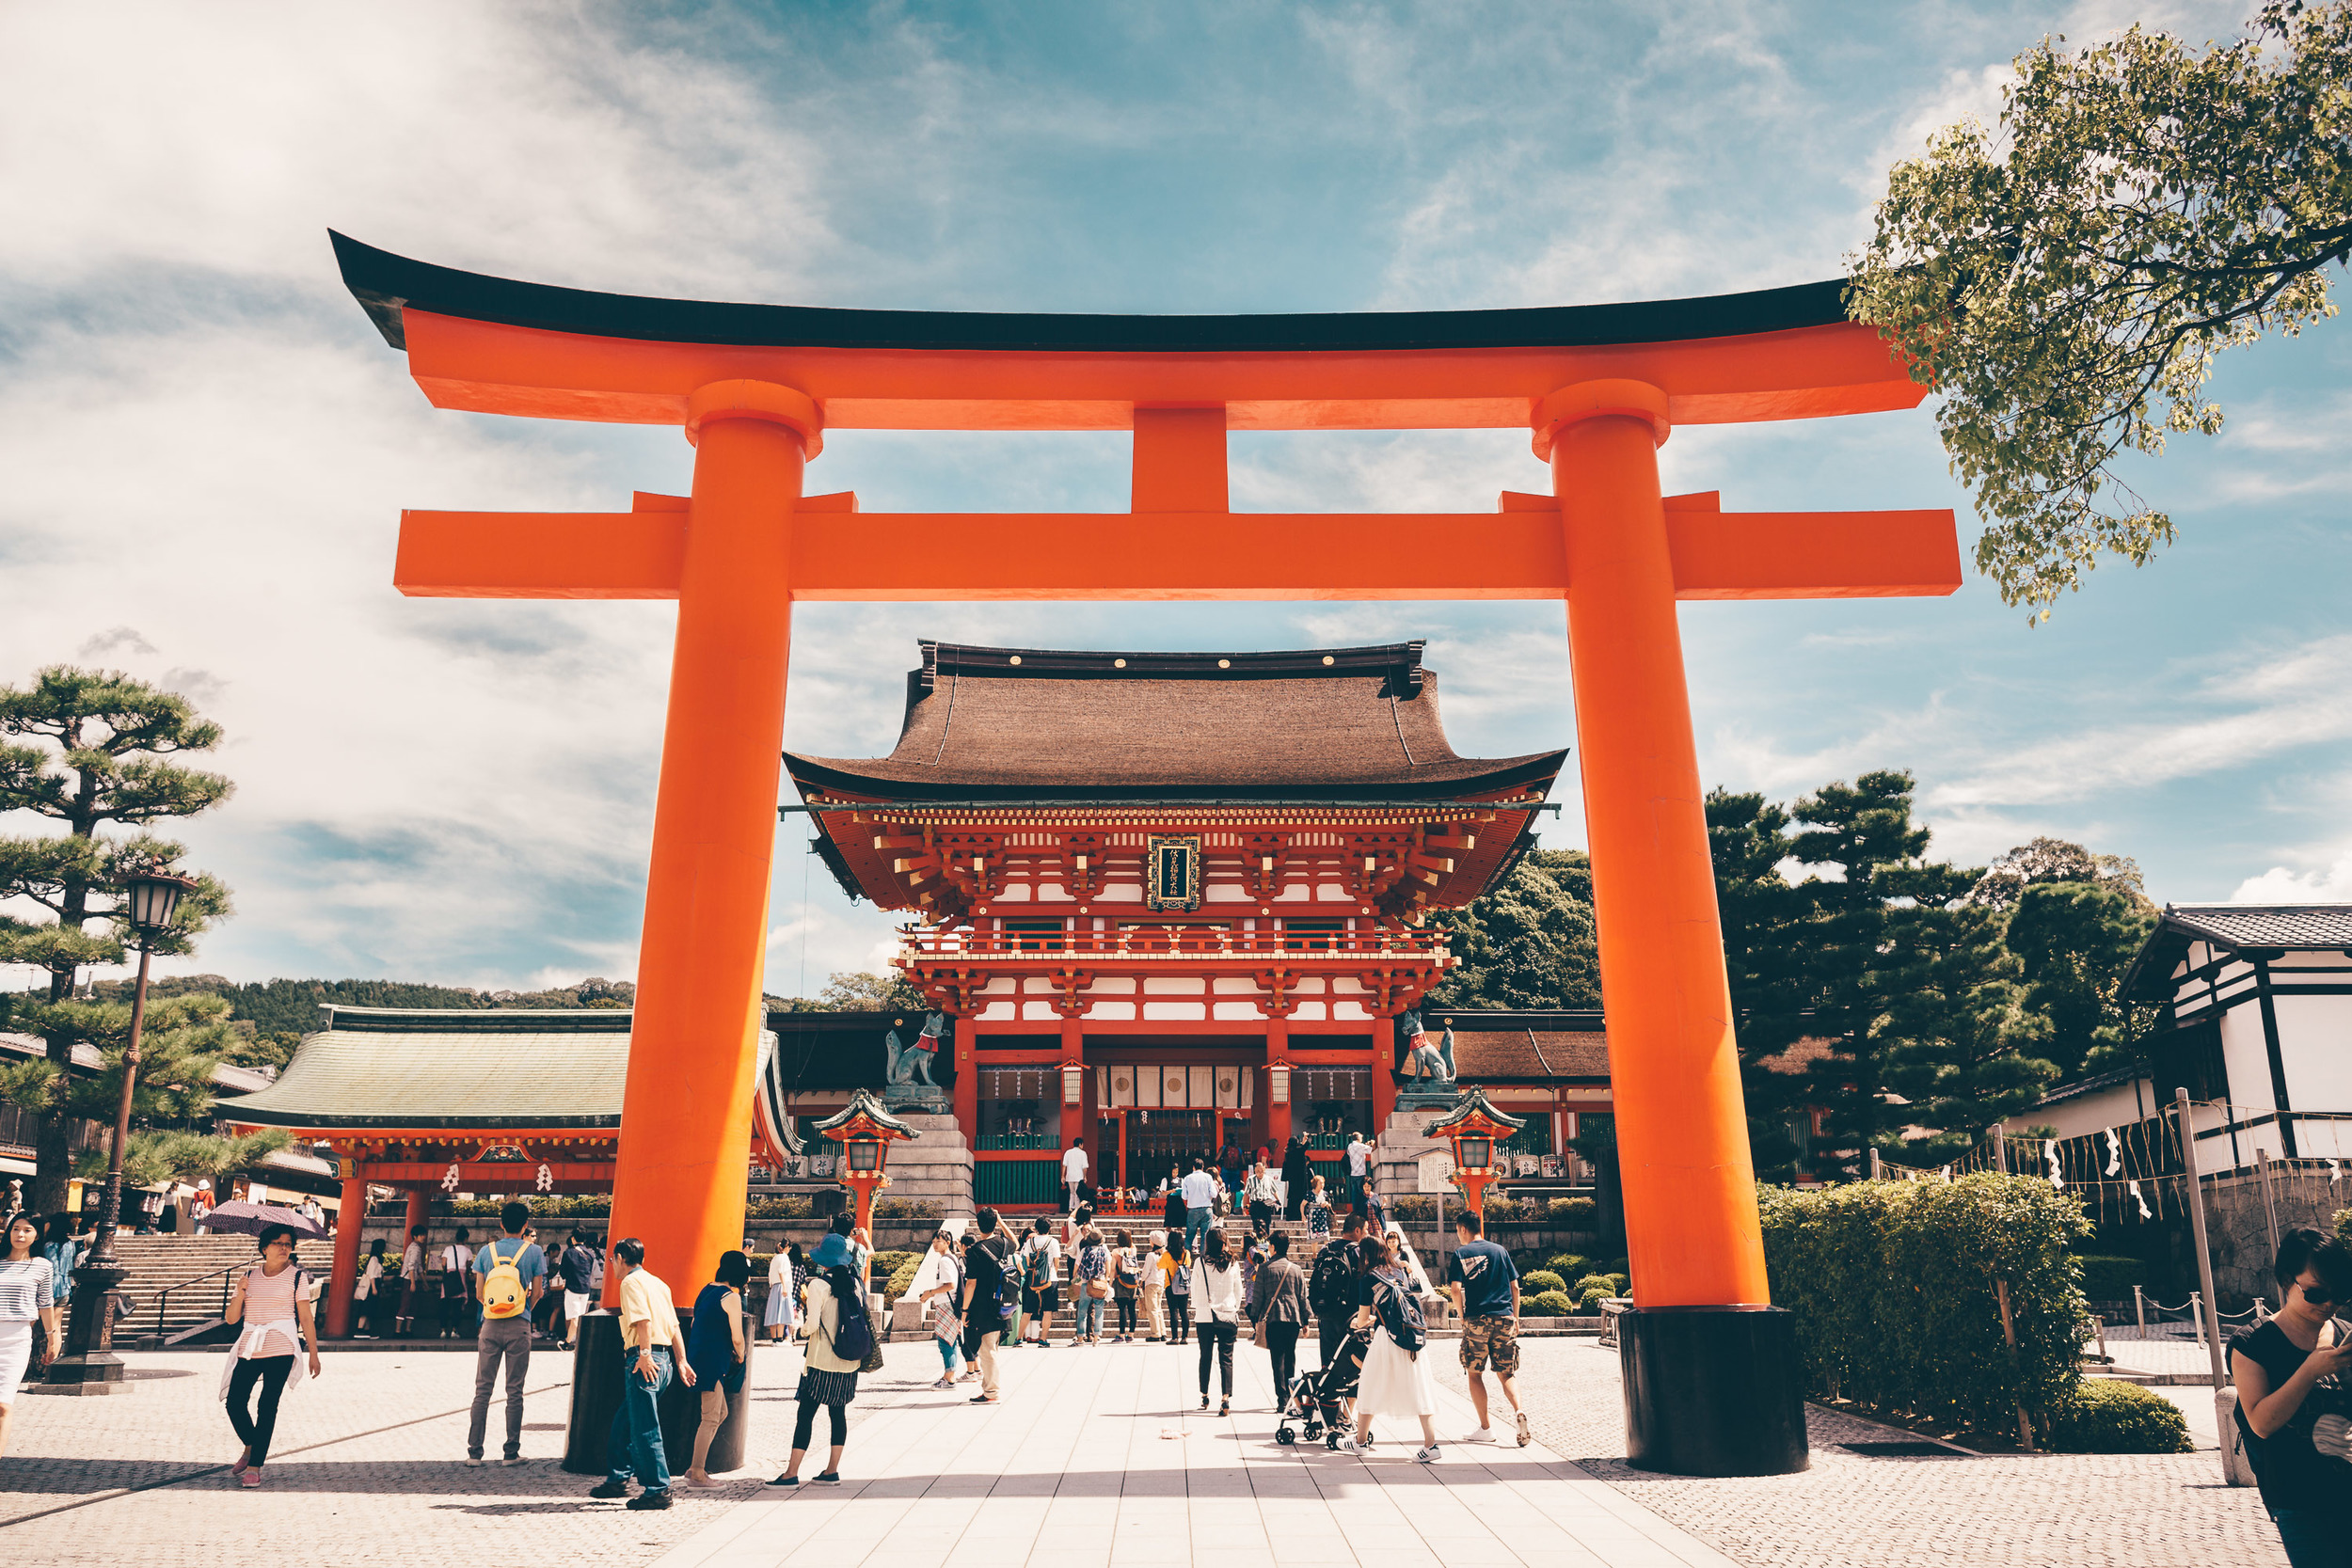 Giant Torii Gate at the entrance to Fushimi Inari Shrine in Kyoto, Japan.